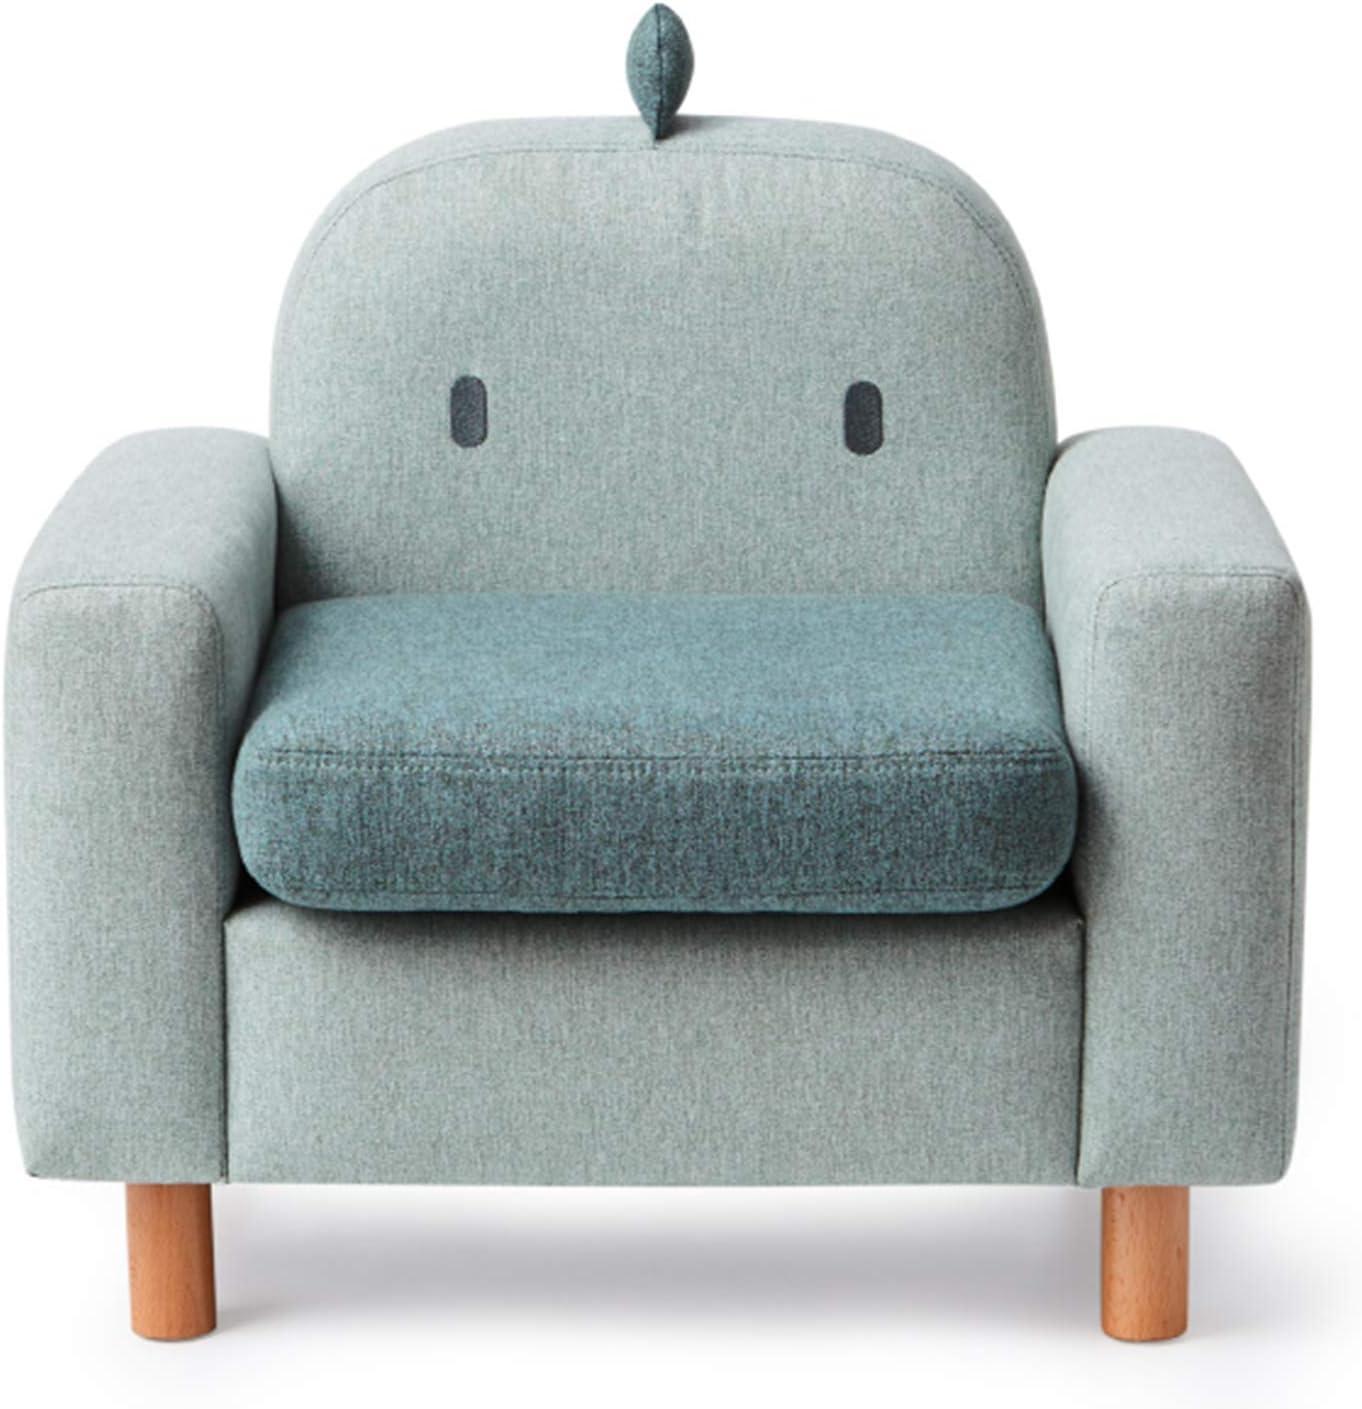 XLSQW Kids Sofa Chair Child's Cartoon Size Mini Translated Deluxe Cute